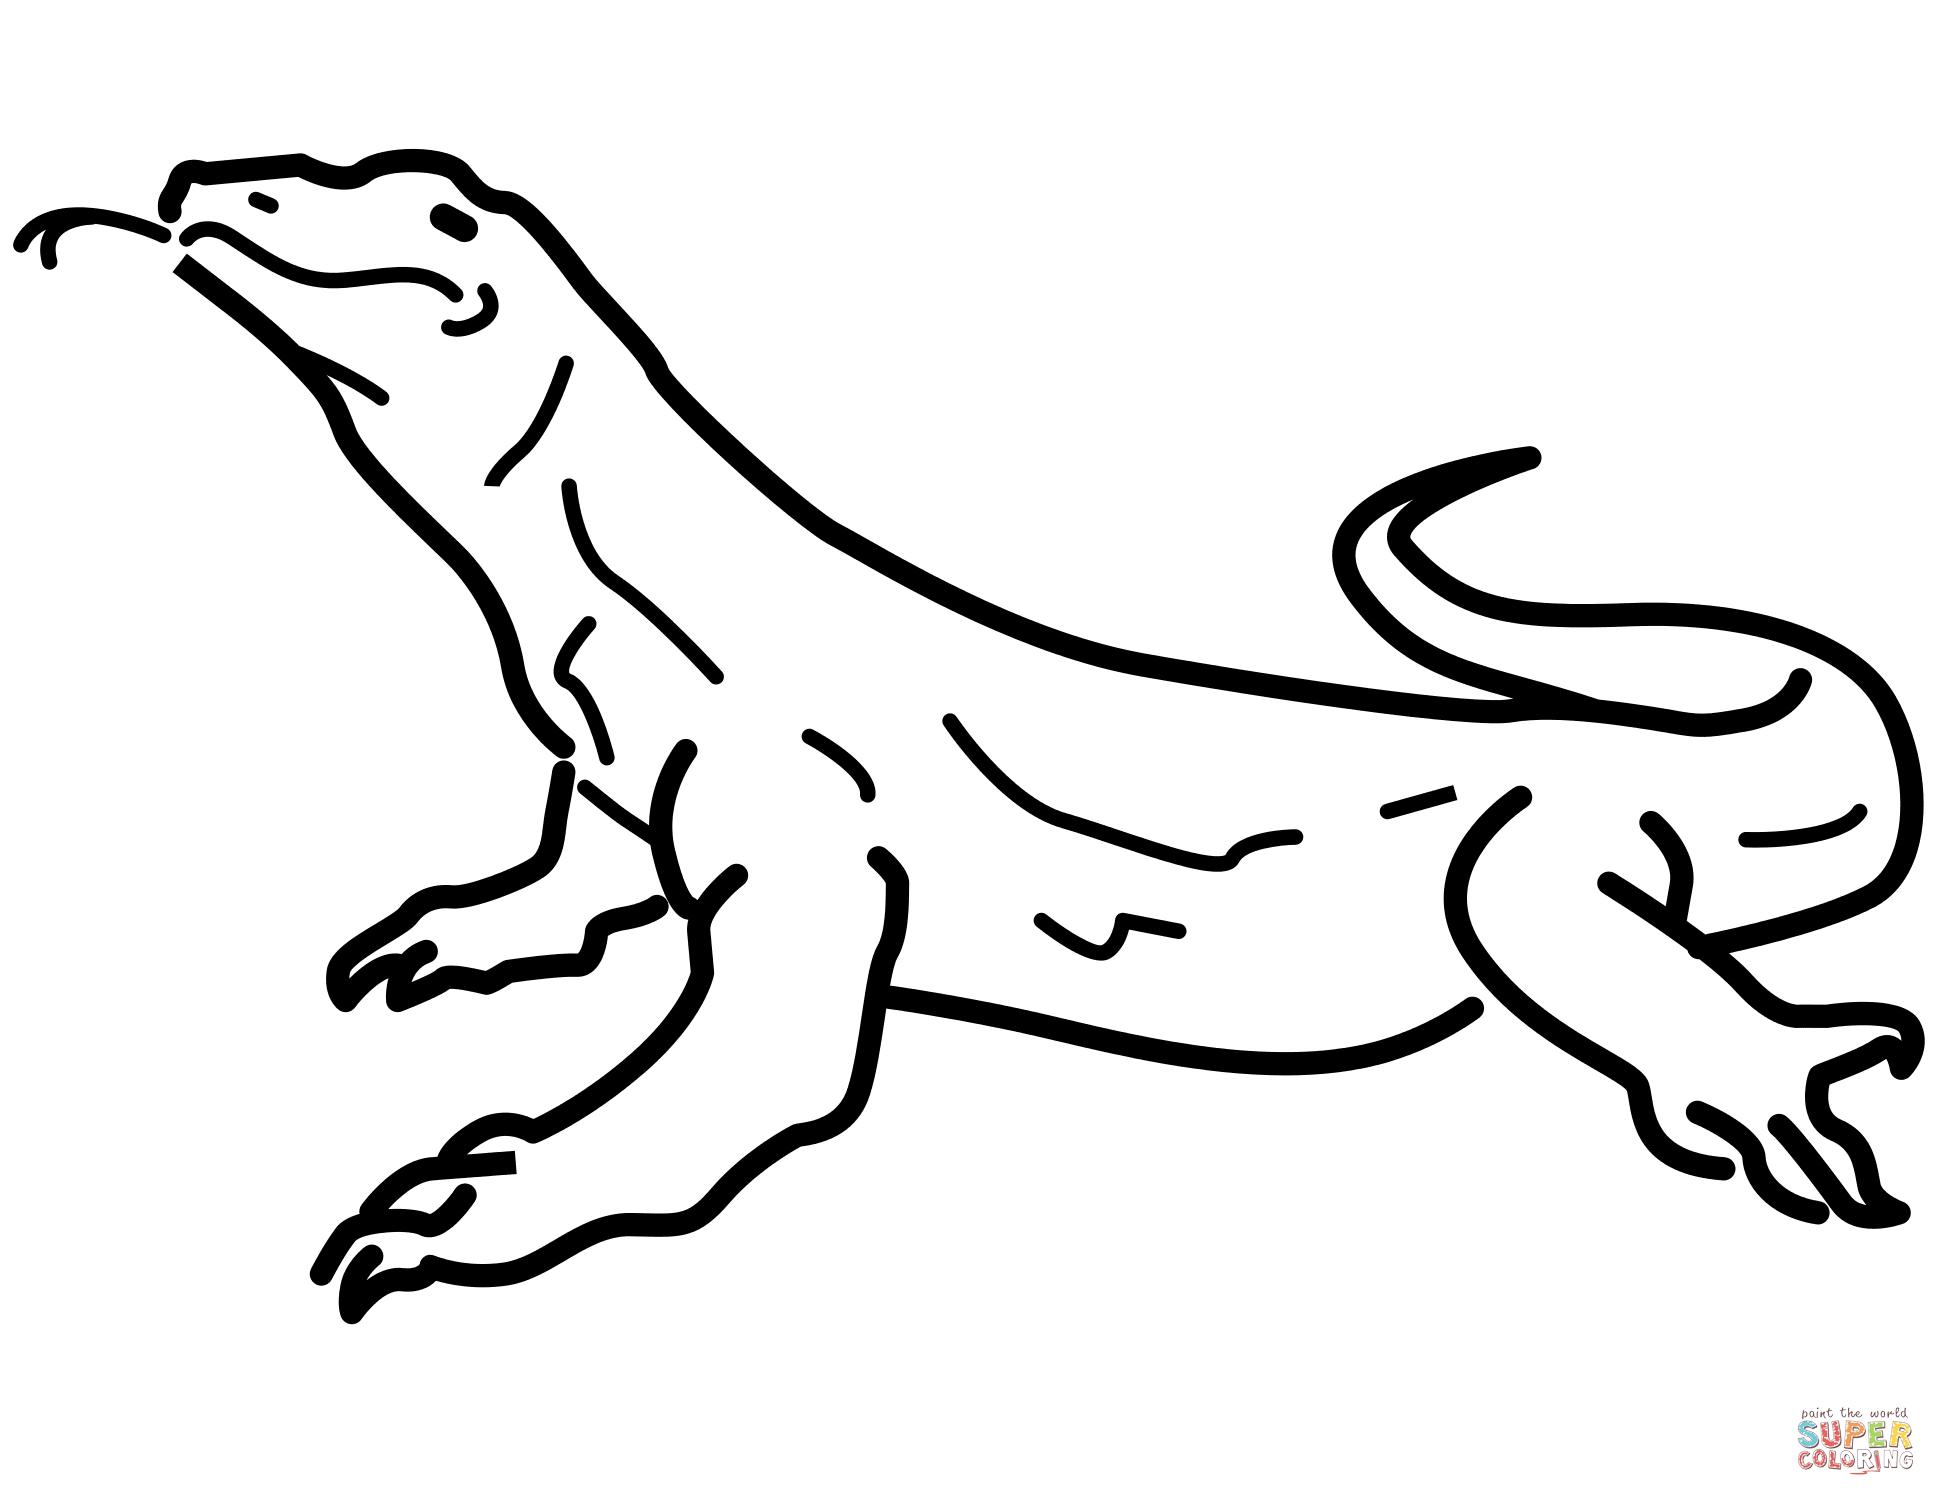 Monitor Lizard coloring, Download Monitor Lizard coloring ...